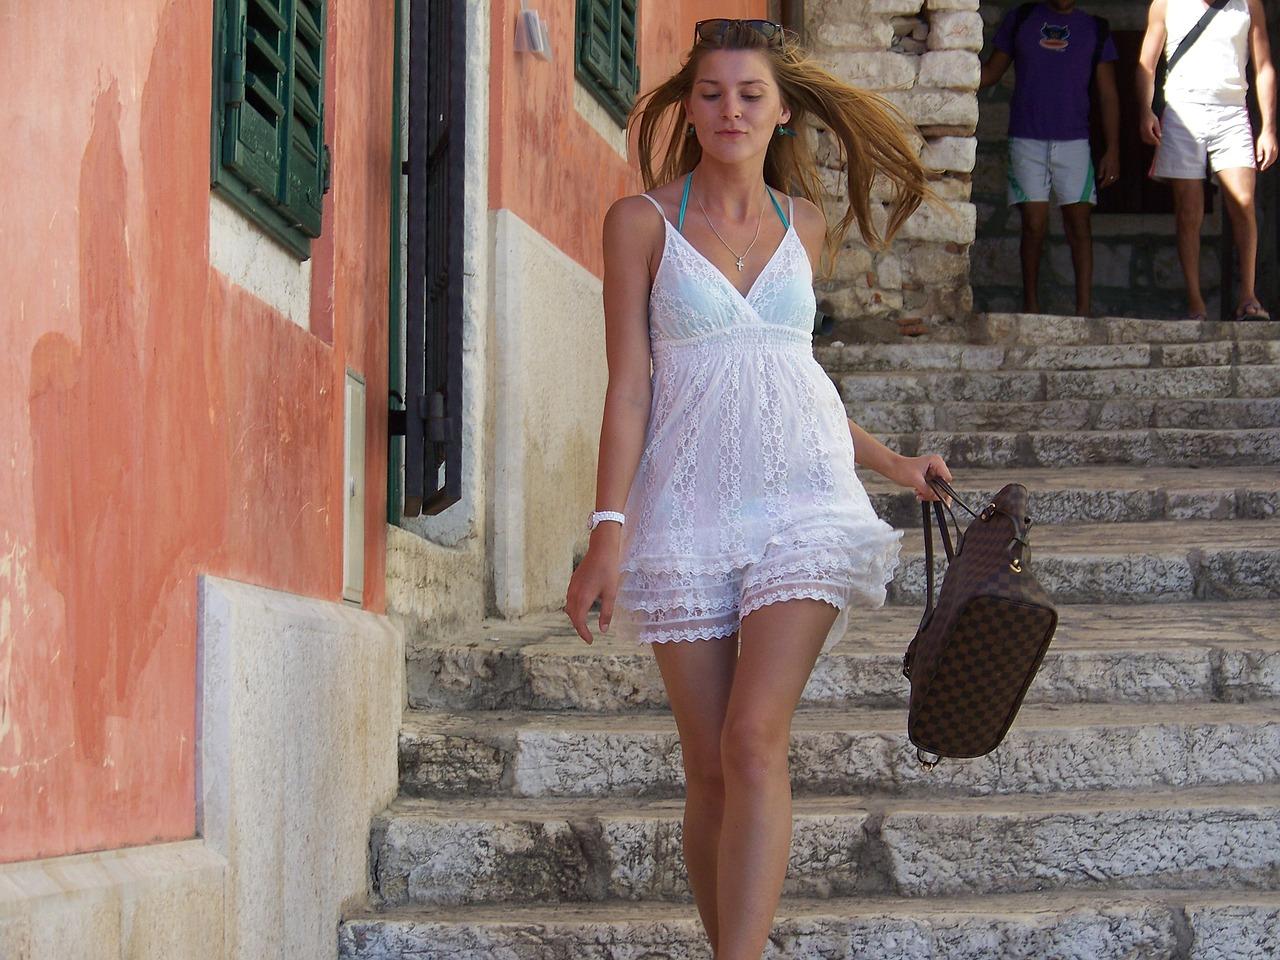 walking-lady-2712559_1280 (1)